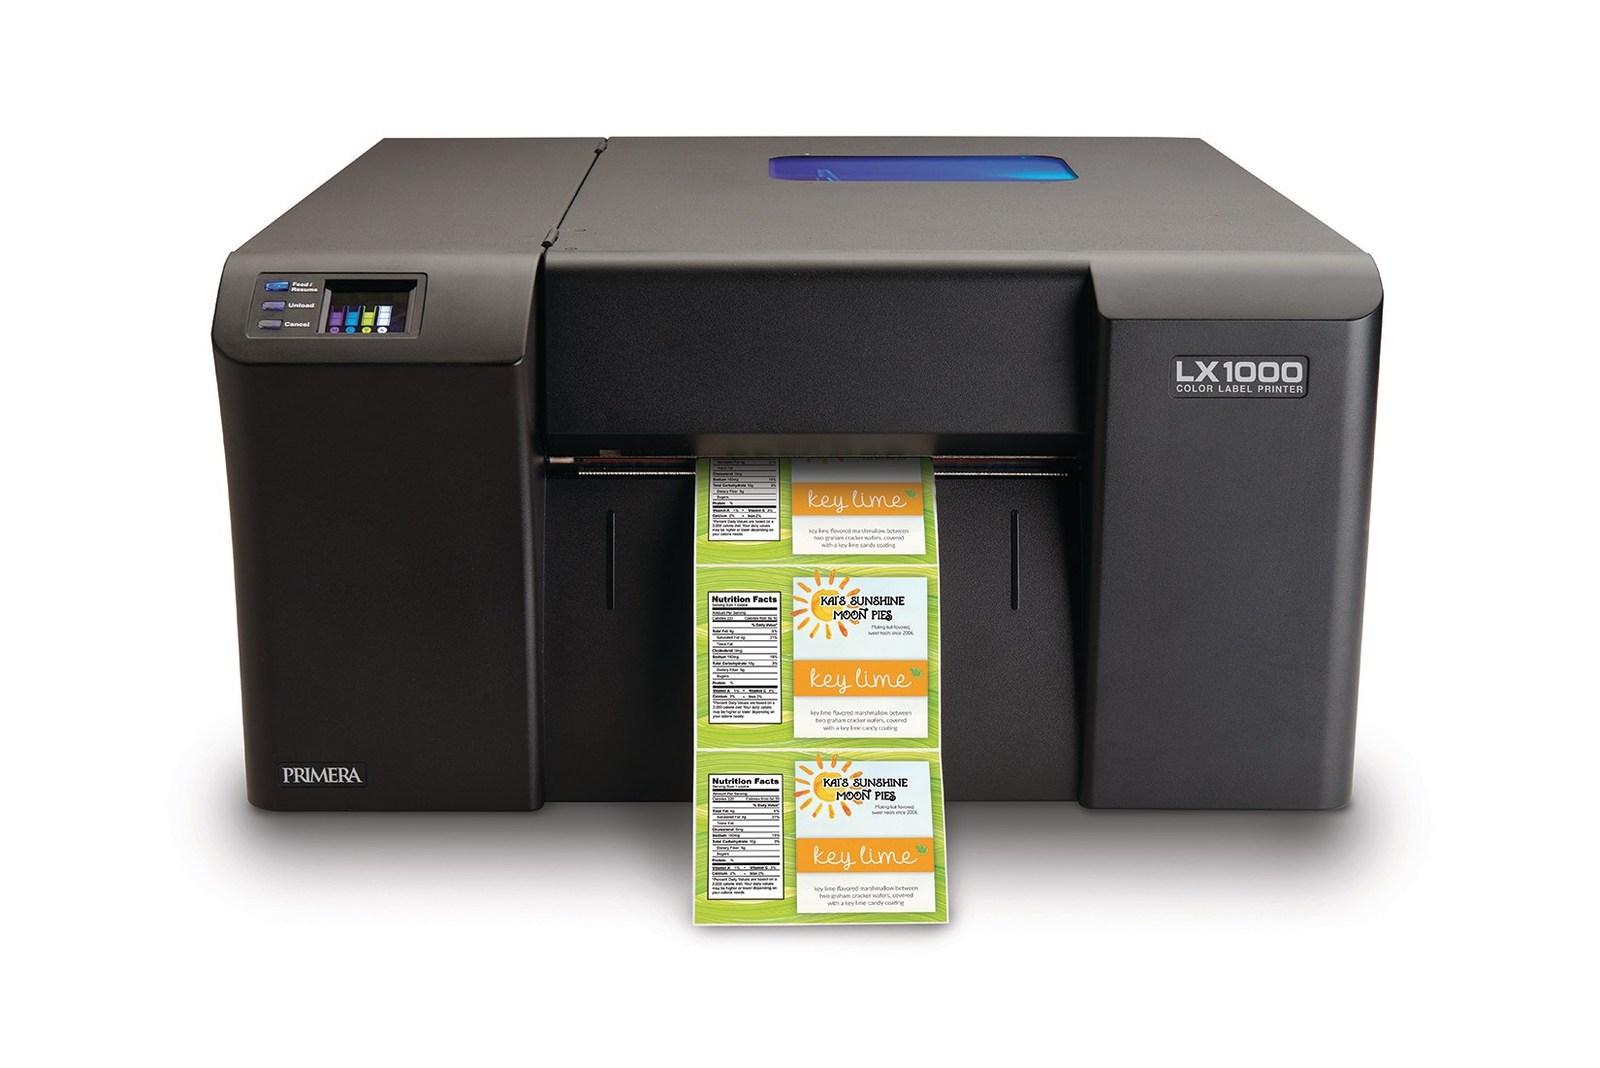 Color printer label - Lx1000 Color Label Printer